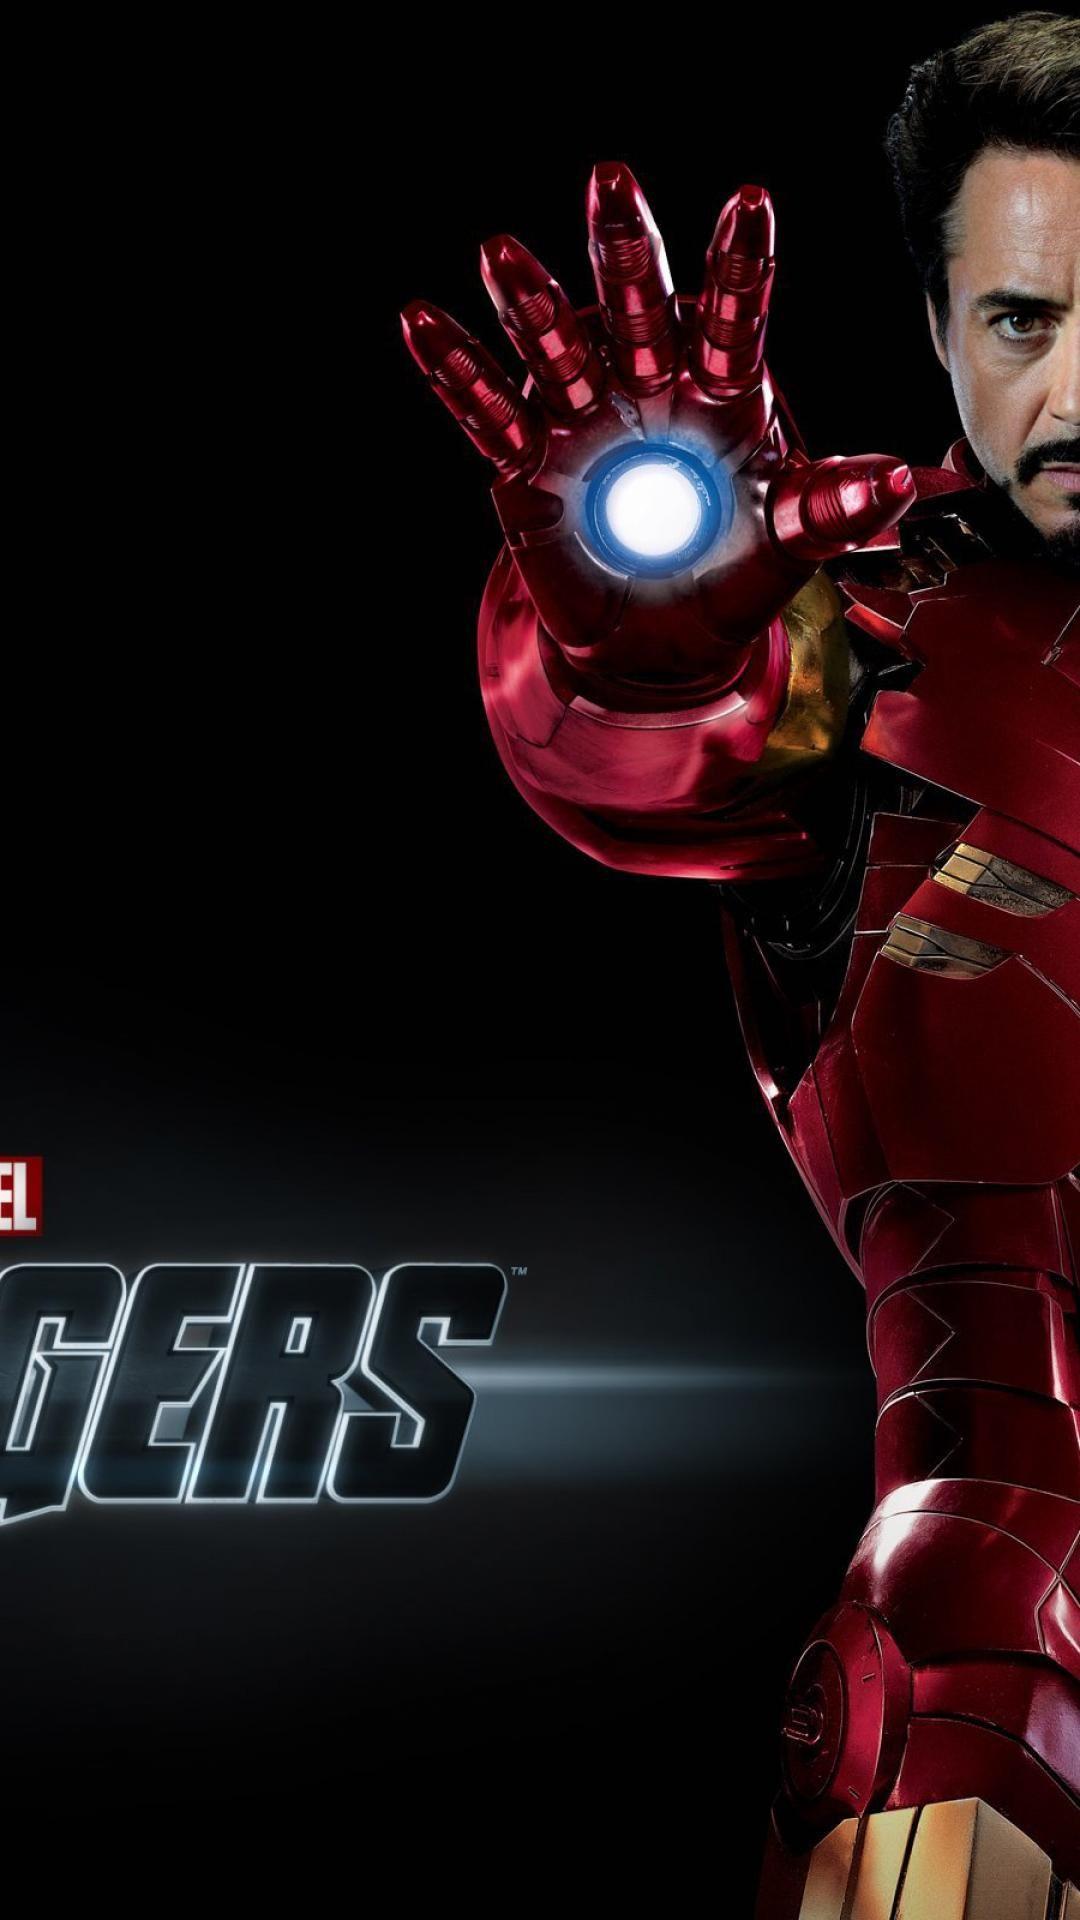 Download Ultra Hd Iron Man Hd Wallpaper For Mobile Cikimmcom